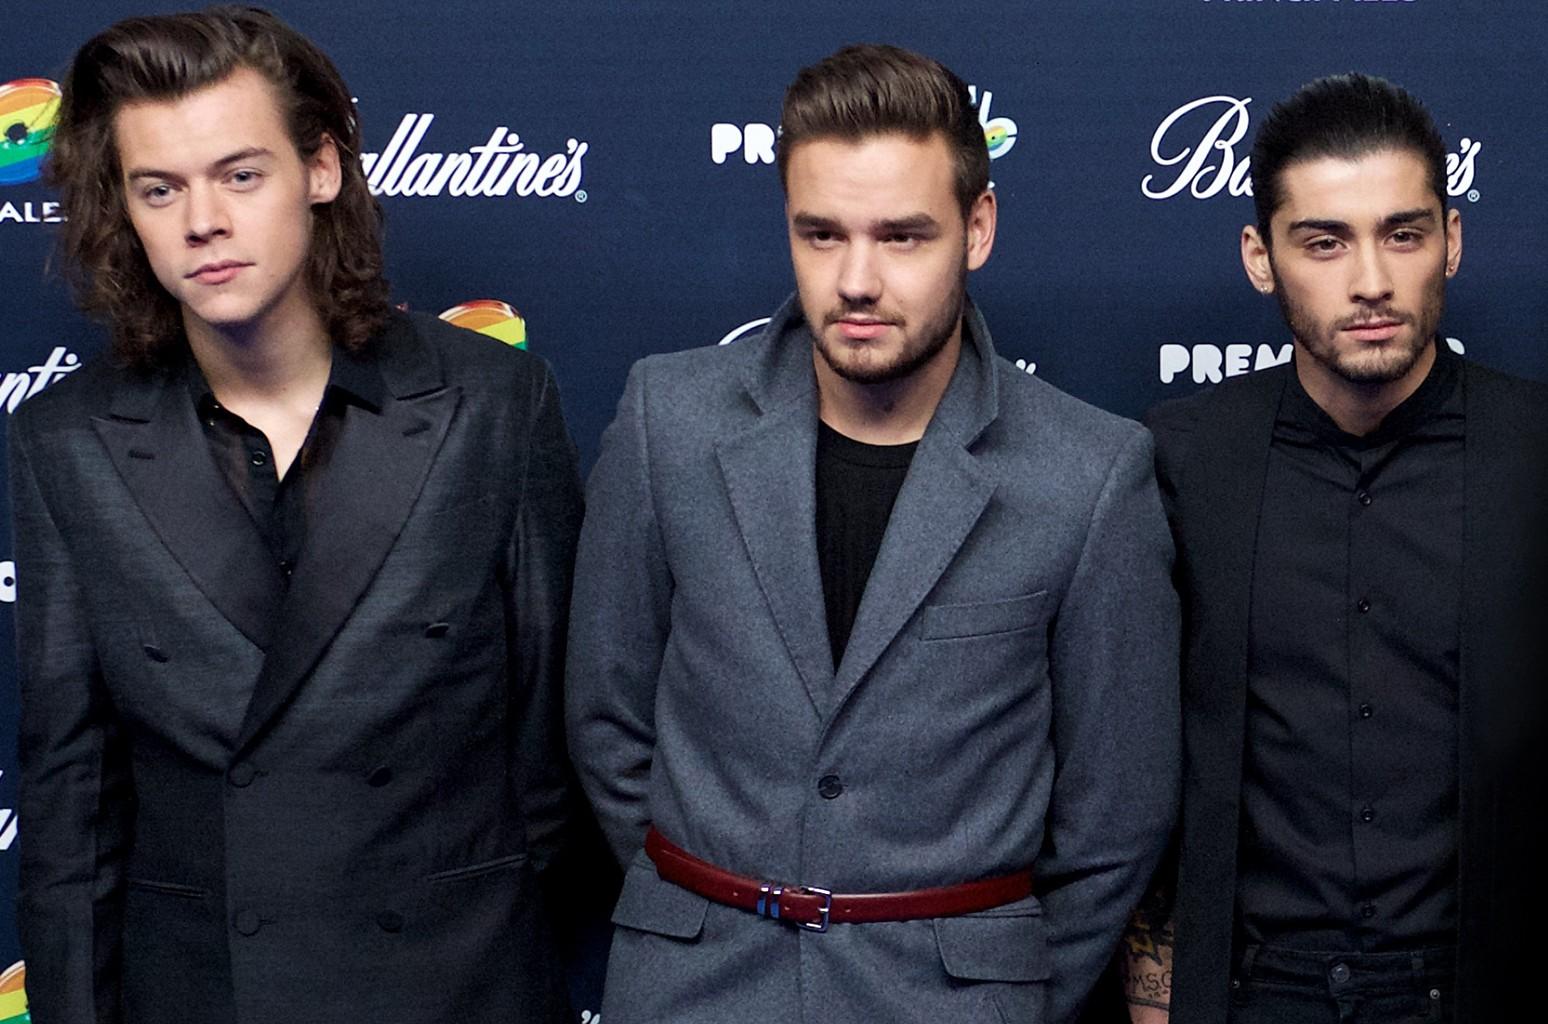 Harry Styles, Liam Payne & Zayn, 2014